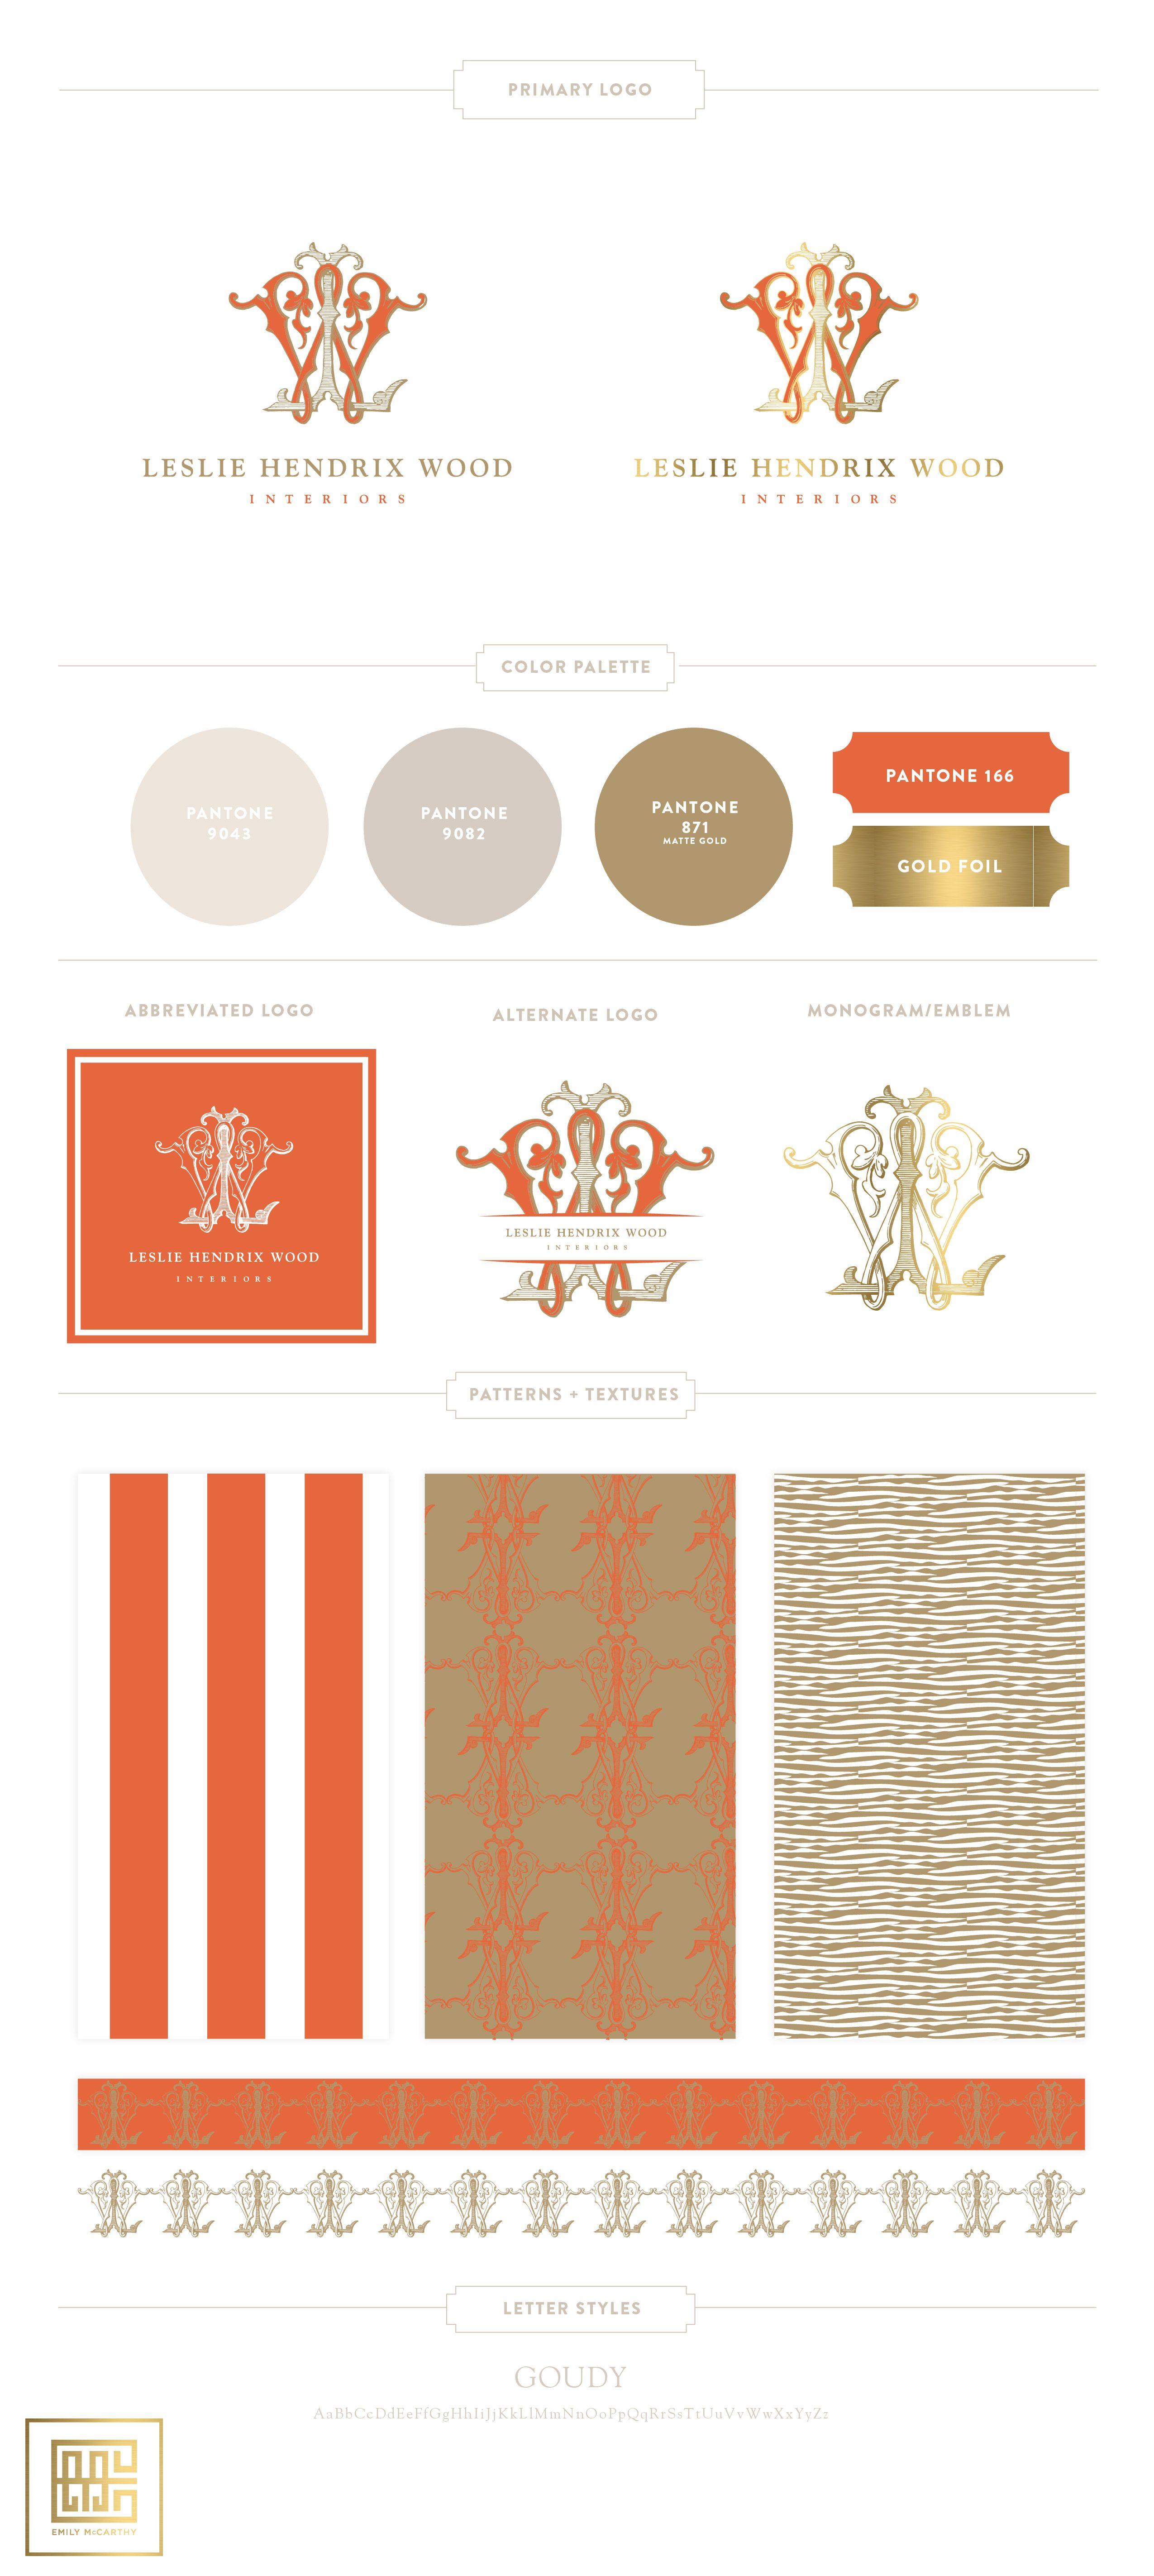 Introducing LESLIE HENDRIX WOOD INTERIORS Luxury logo